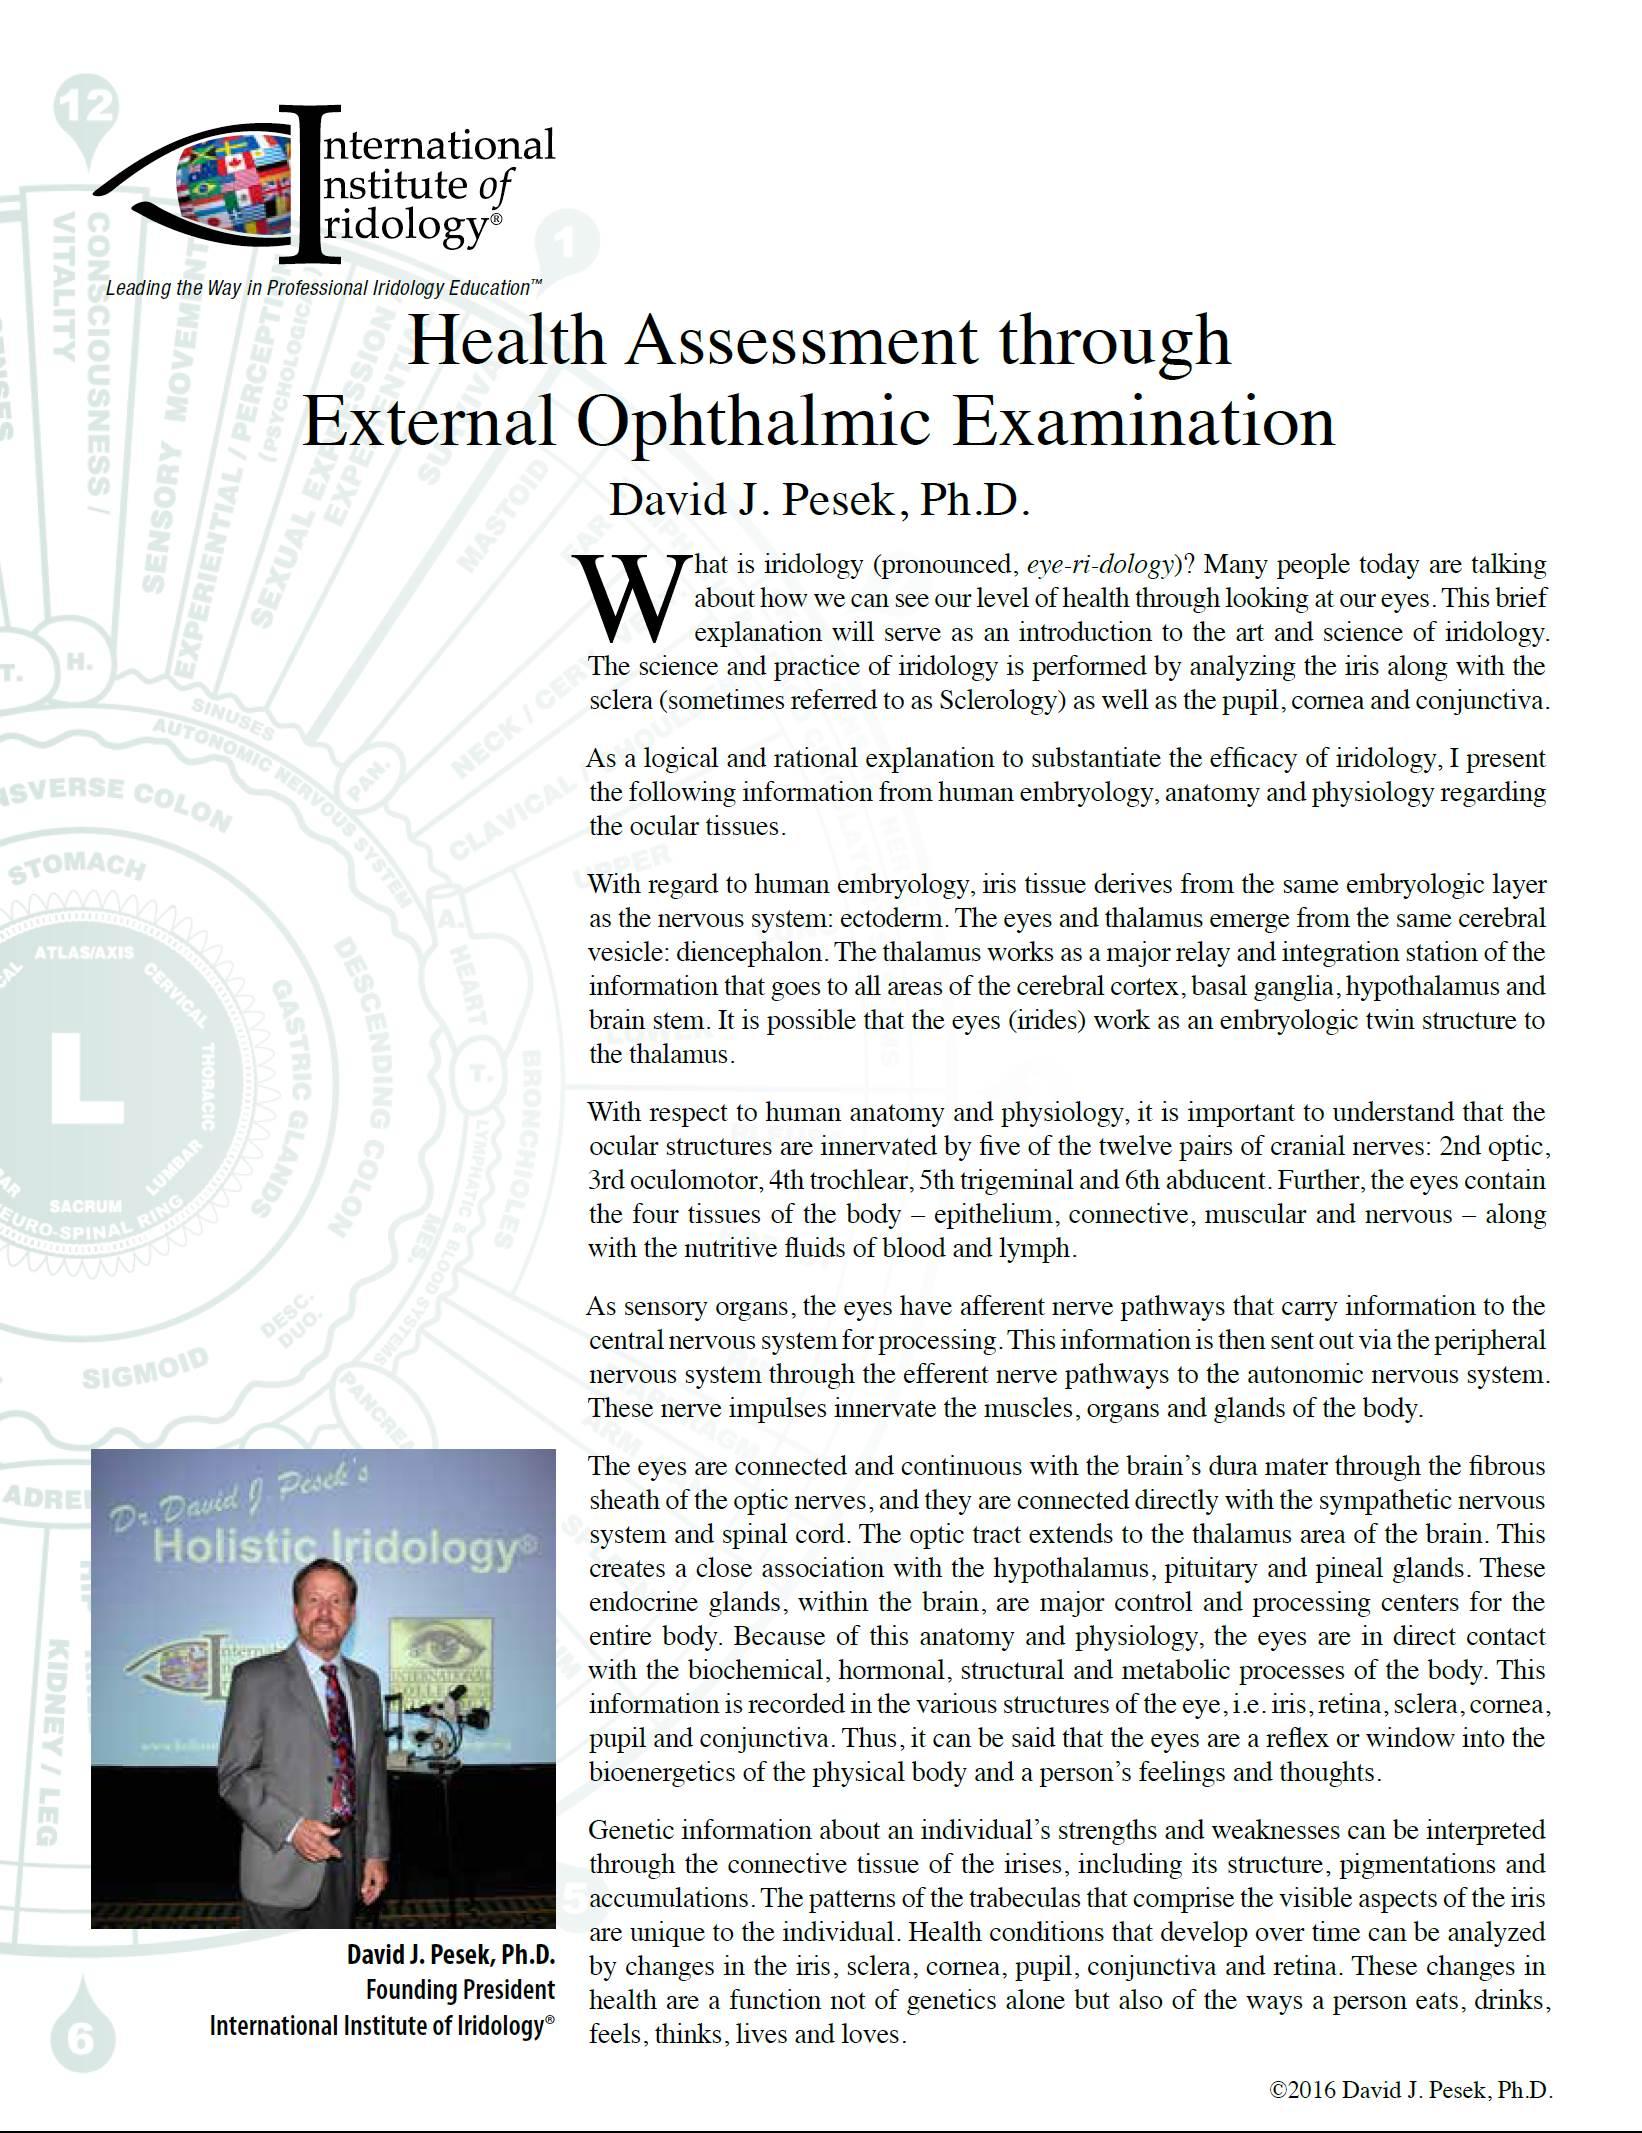 Health_Assessment_through_External_Ophthalmic_Examination,_an_article_by_David_J._Pesek,_Ph.D